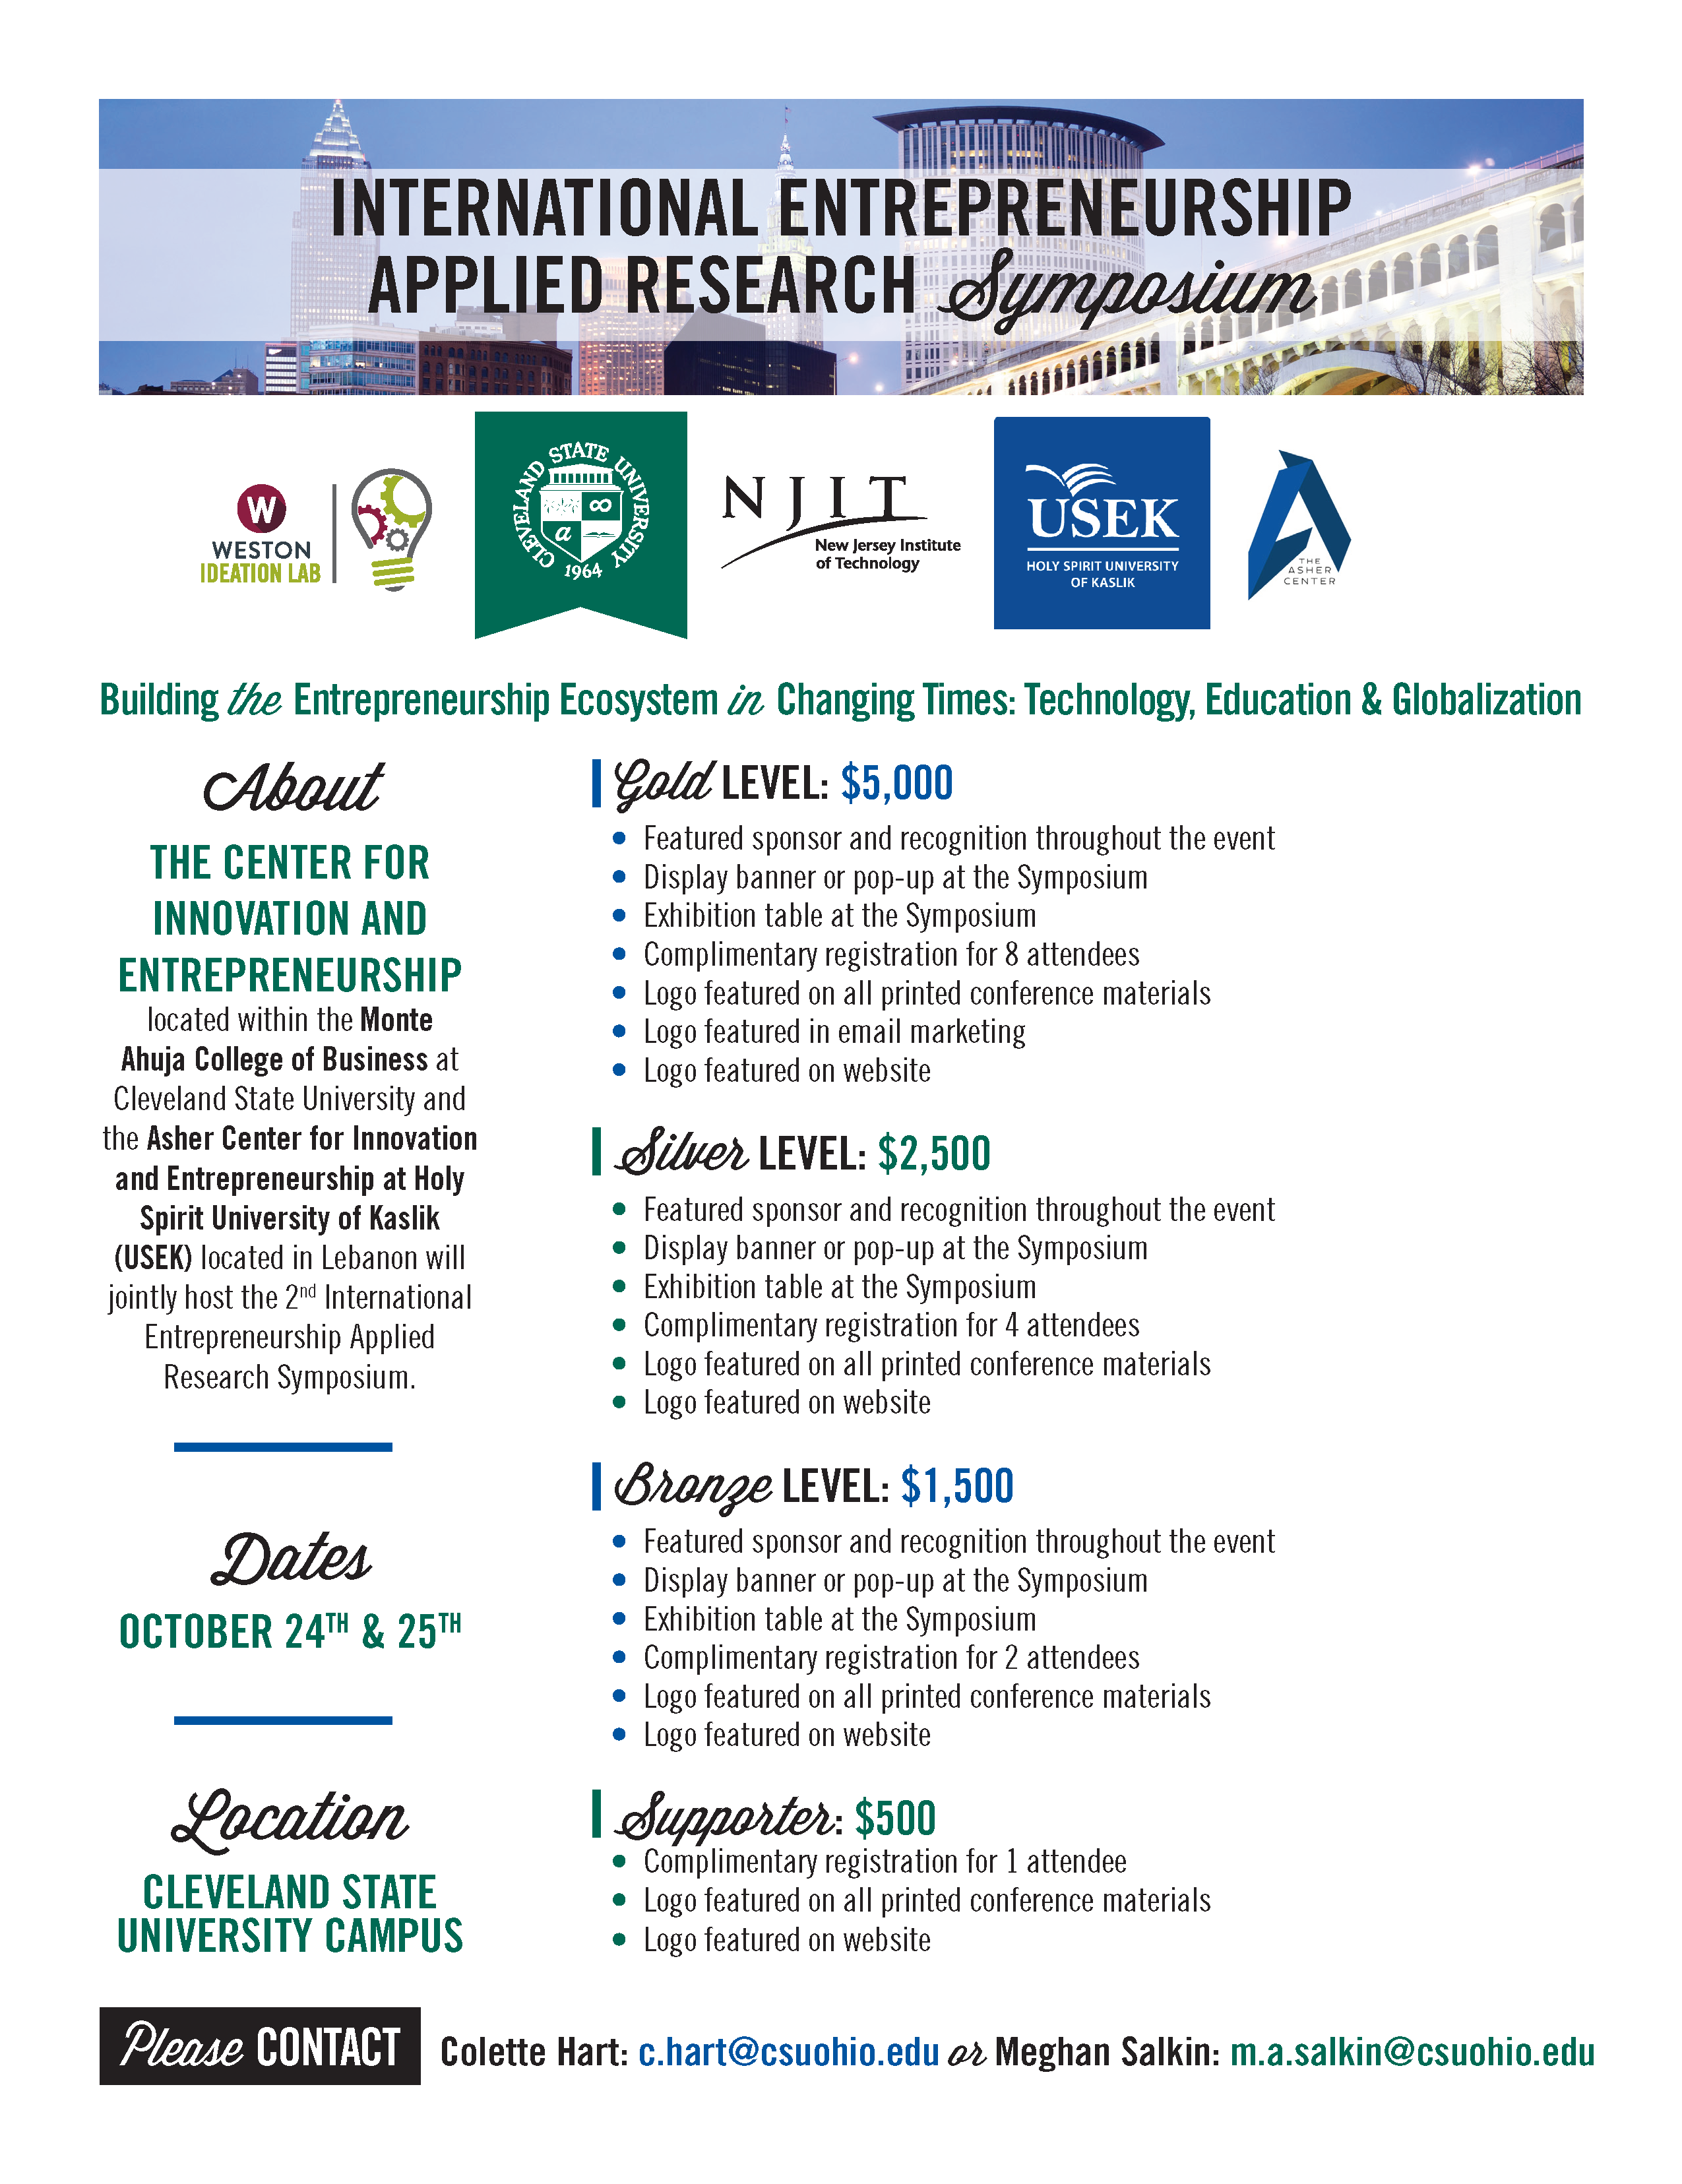 International Entrepreneurship Applied Research Symposium - Sponsorship